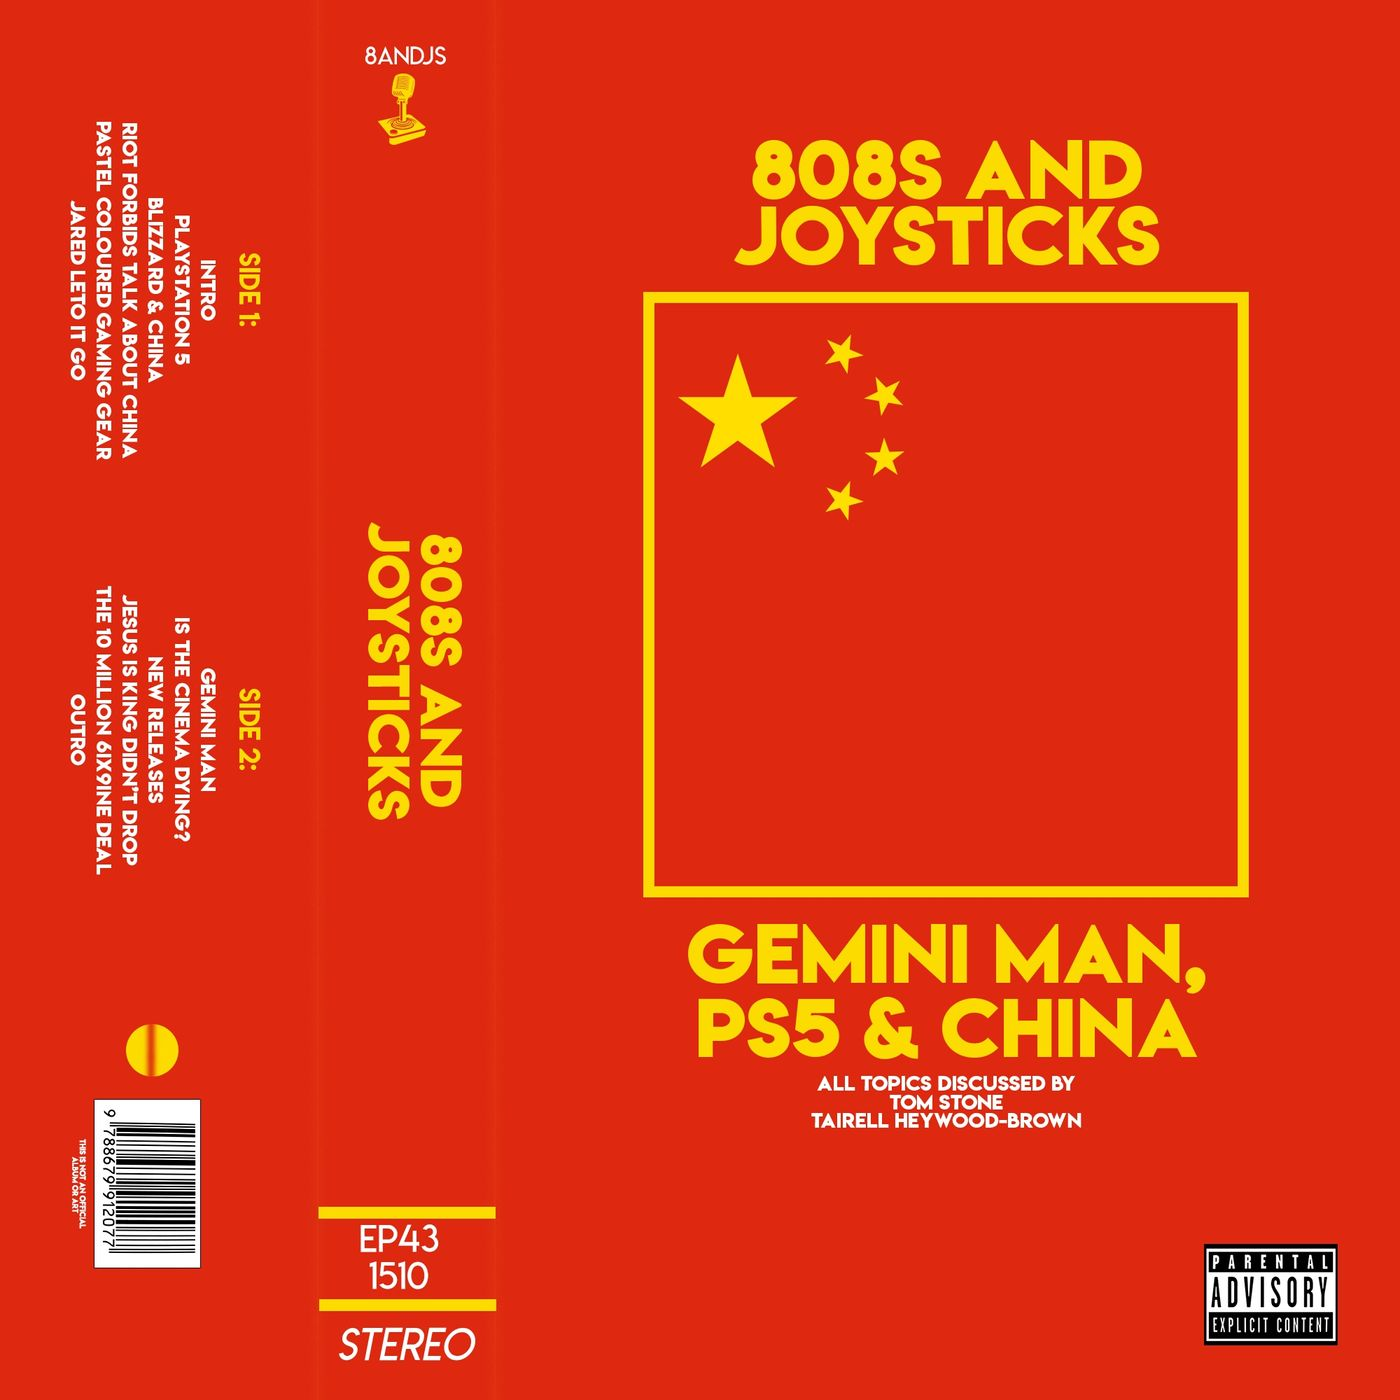 Episode 43: Gemini Man, PlayStation 5 and China Censoring